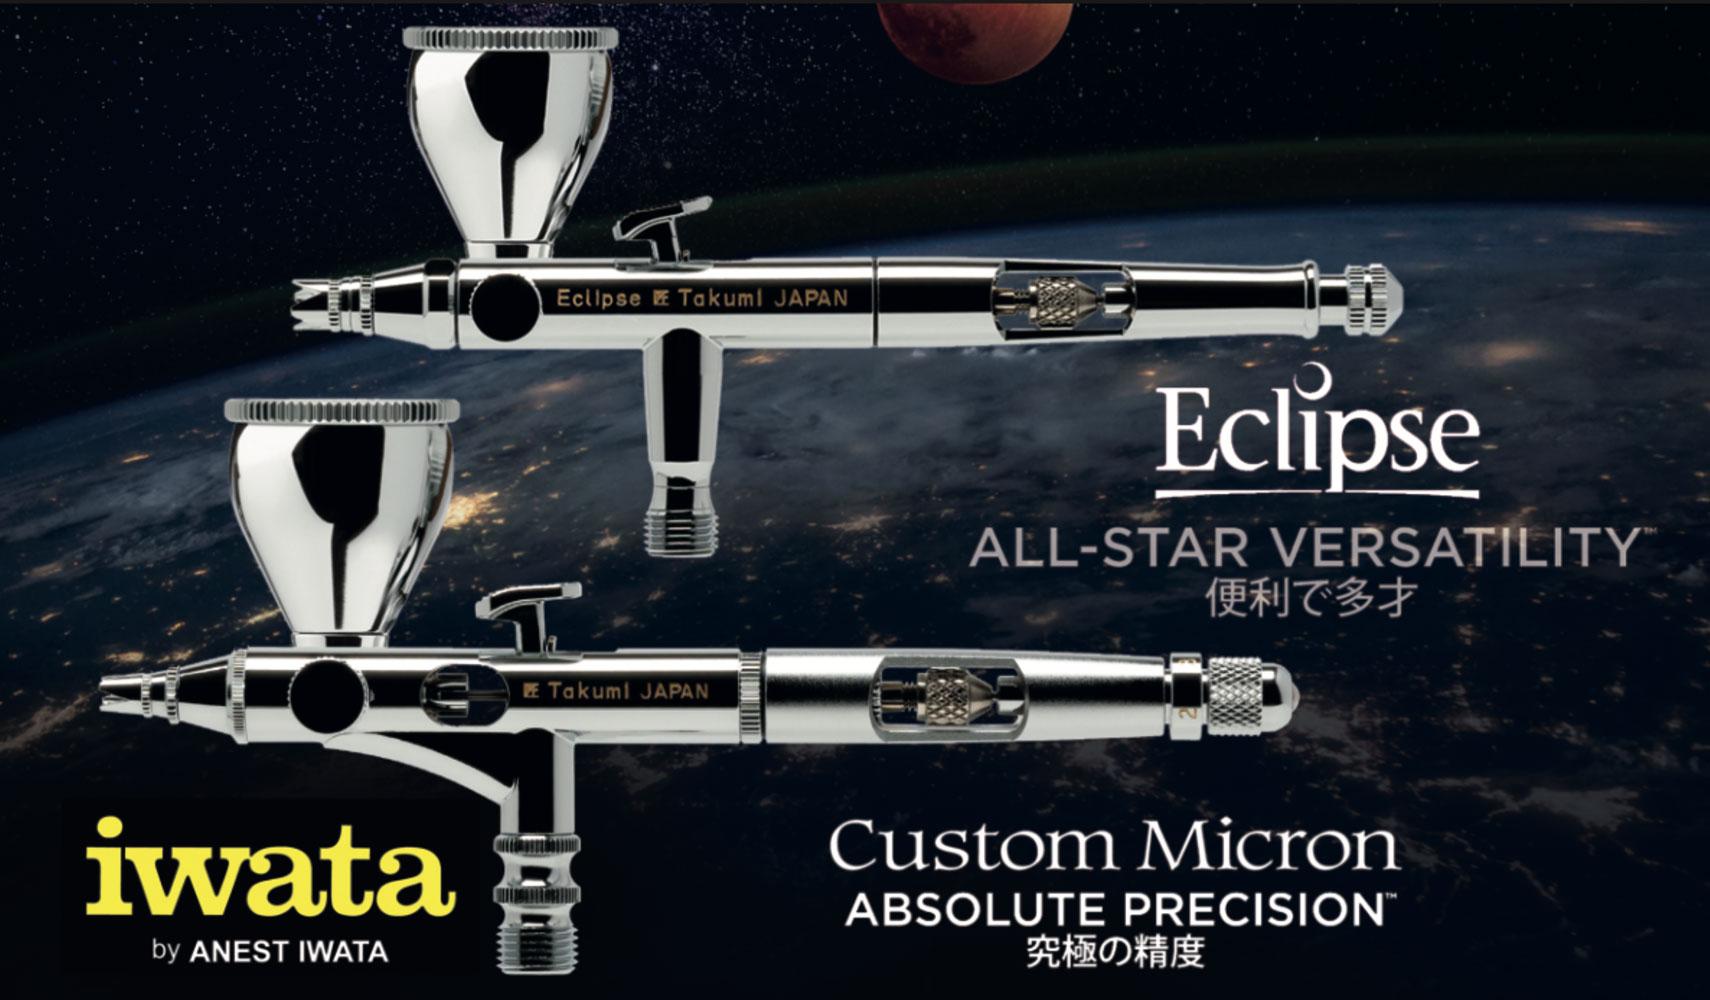 Iwata Takumi: The new side feed airbrushes